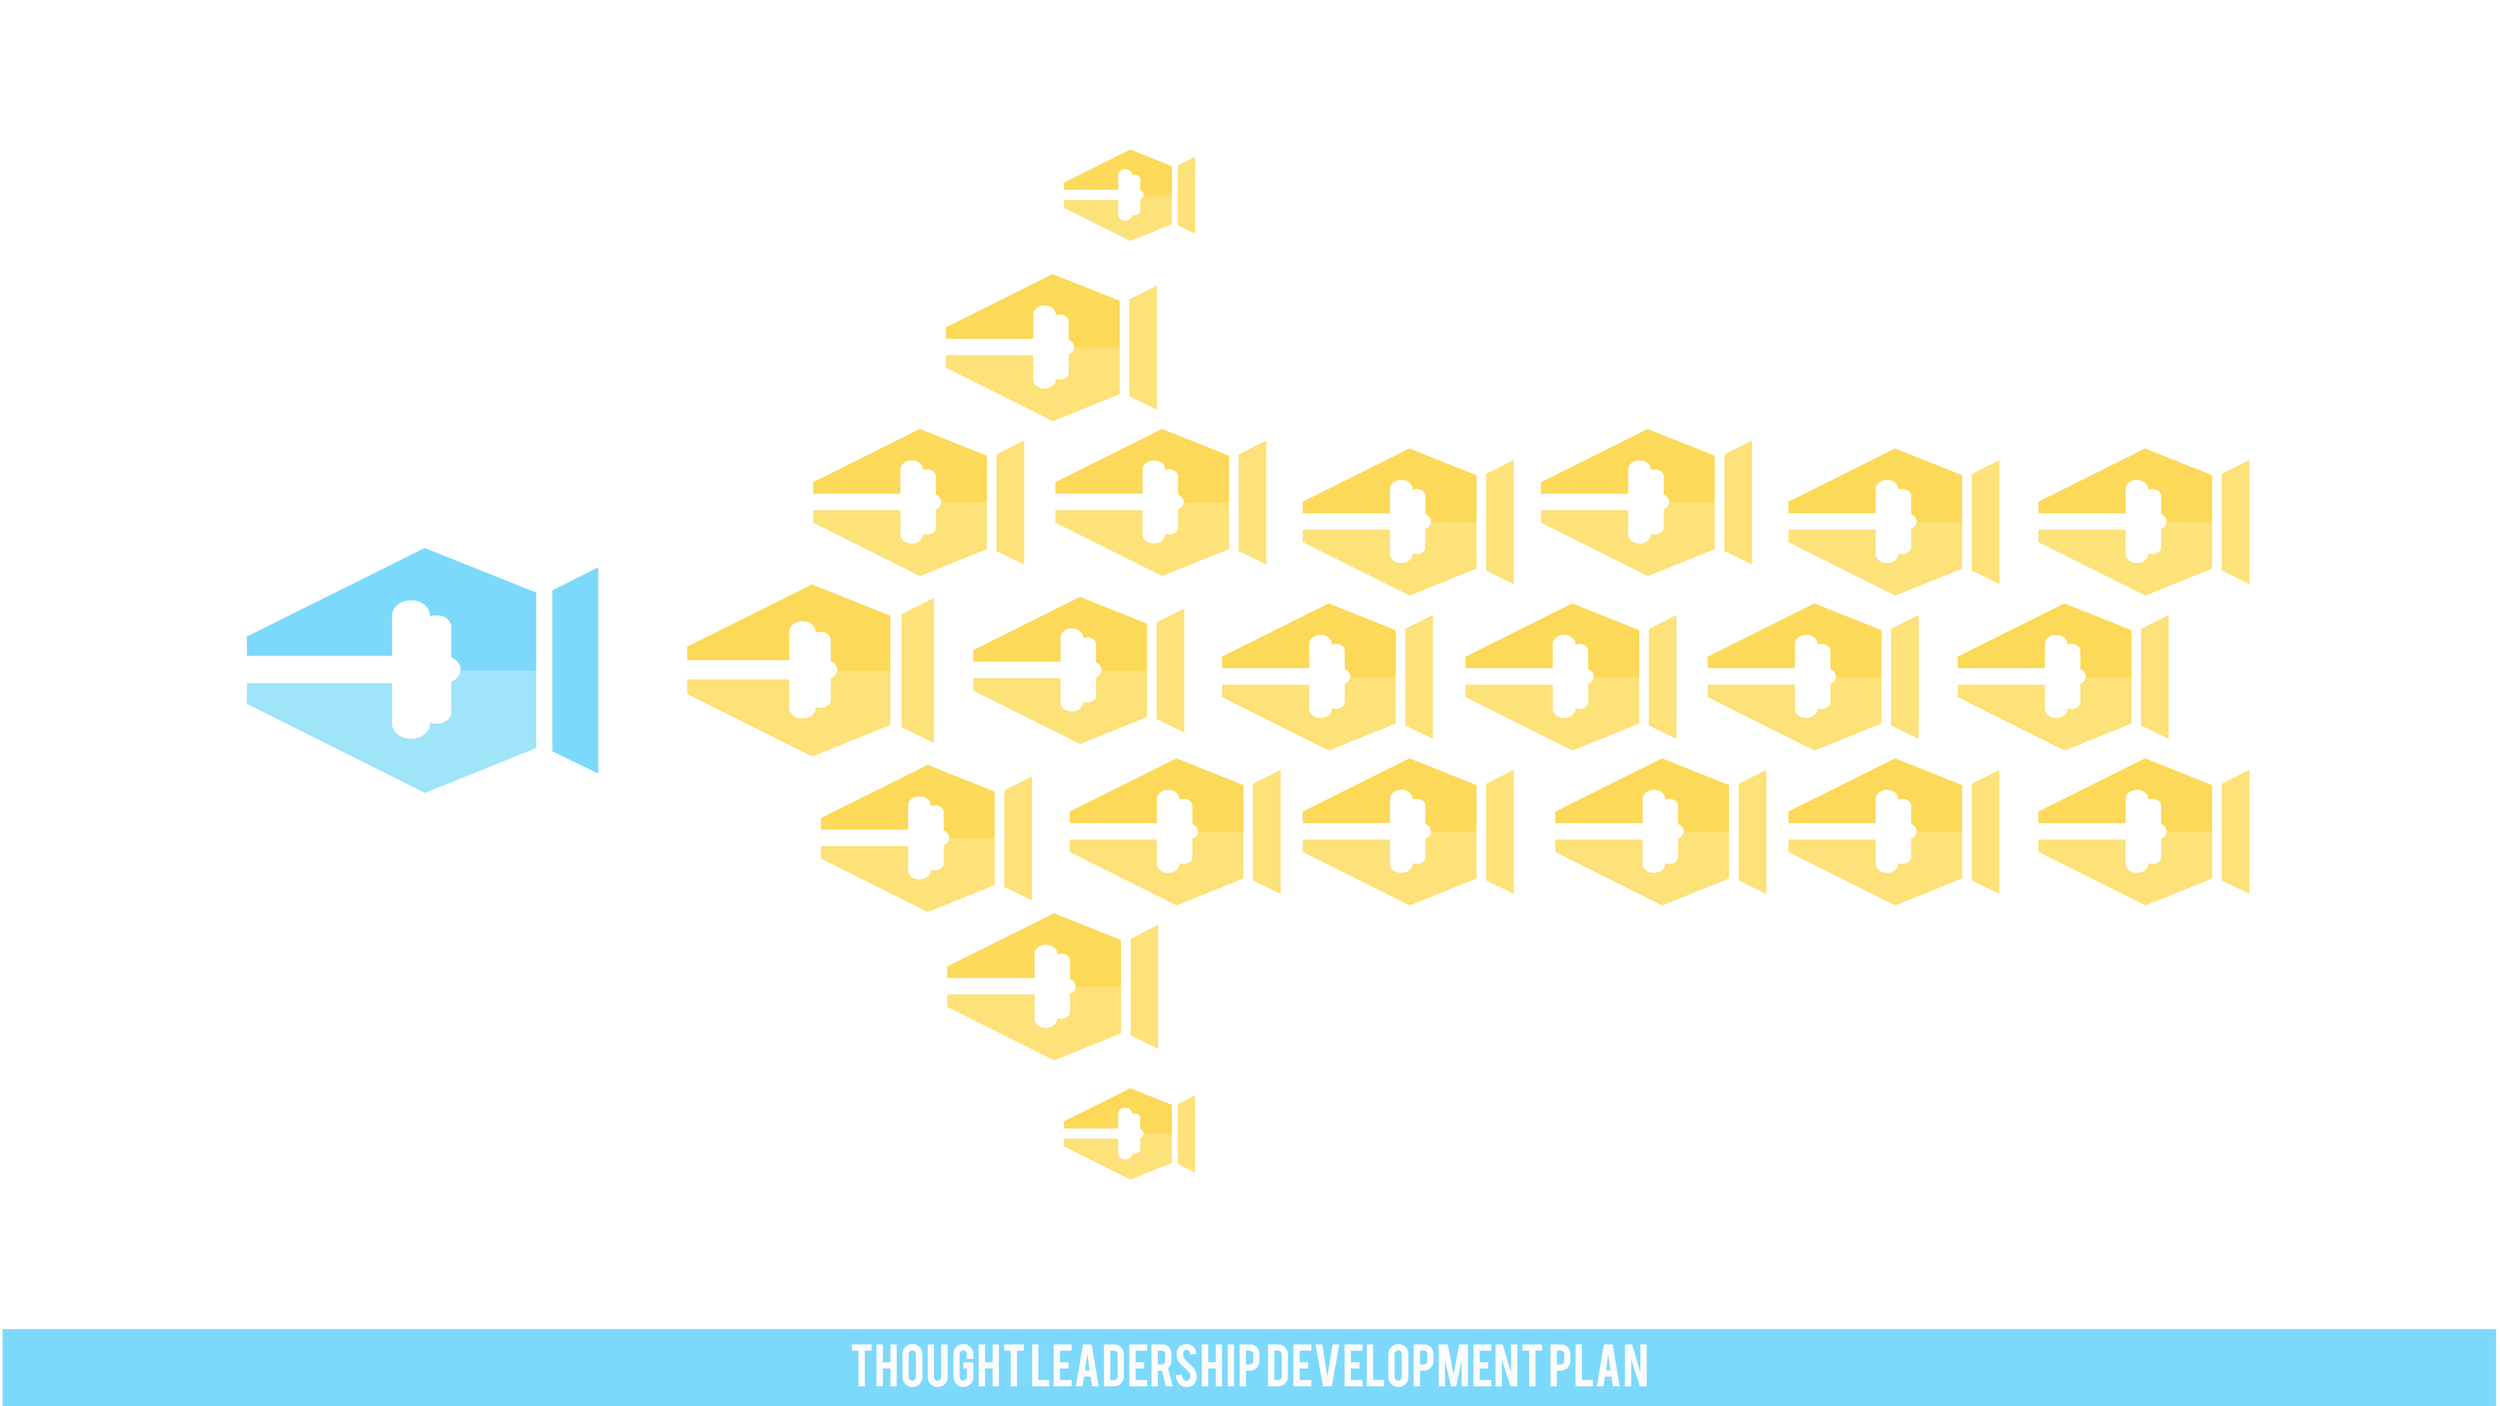 Copy_Buffs_Thought_Leadership_Development_Plan-01.png